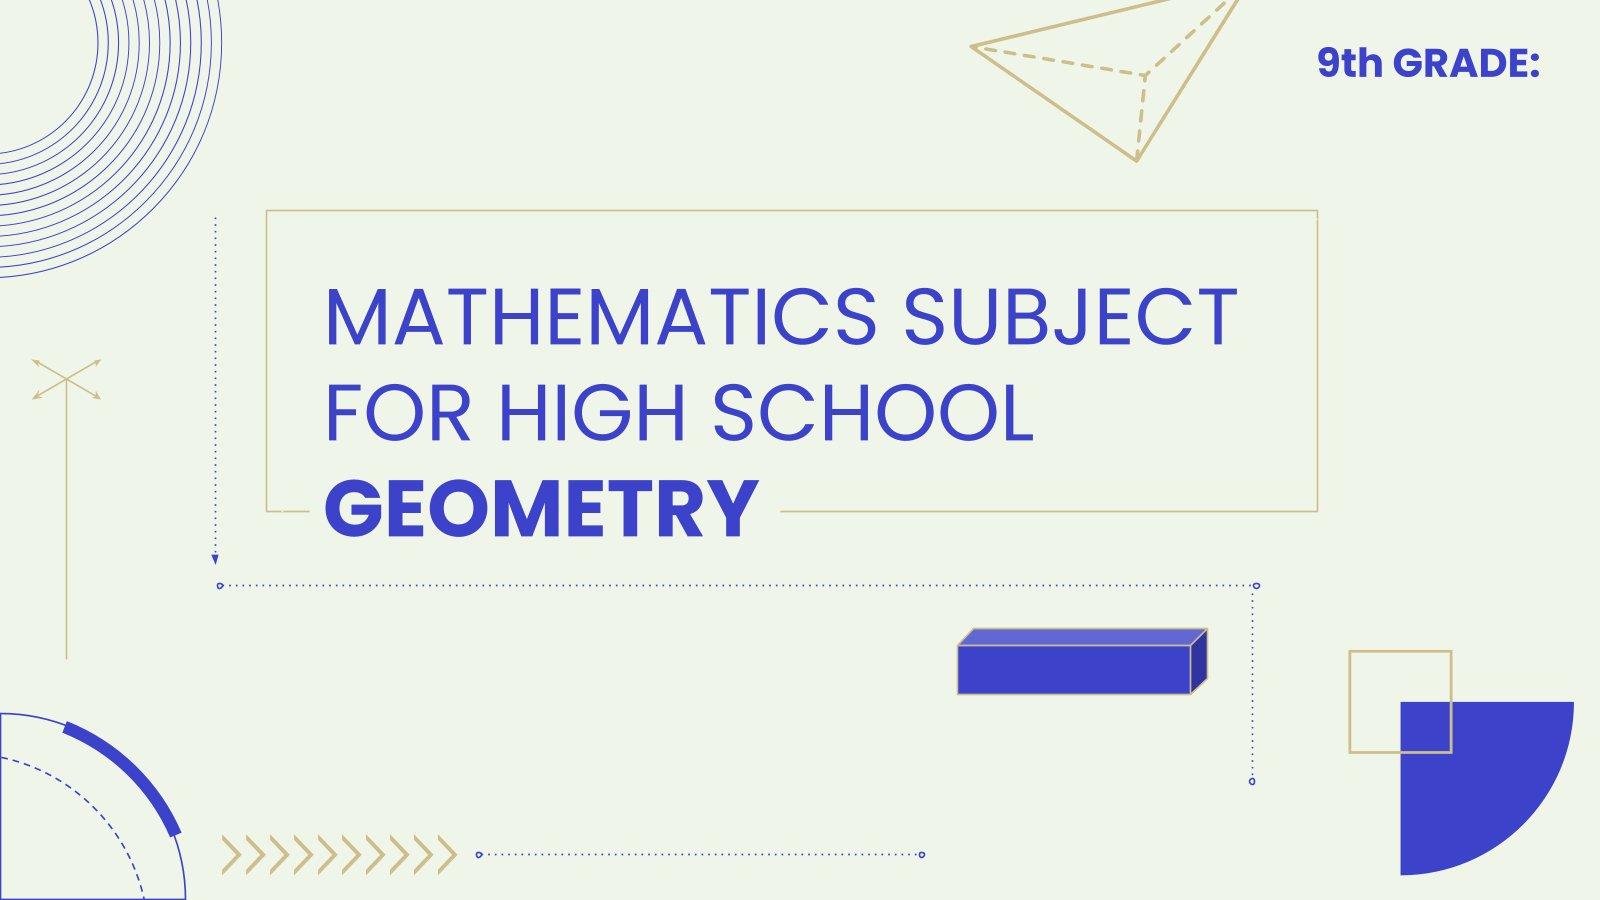 Plantilla de presentación Matemáticas para secundaria: Geometría